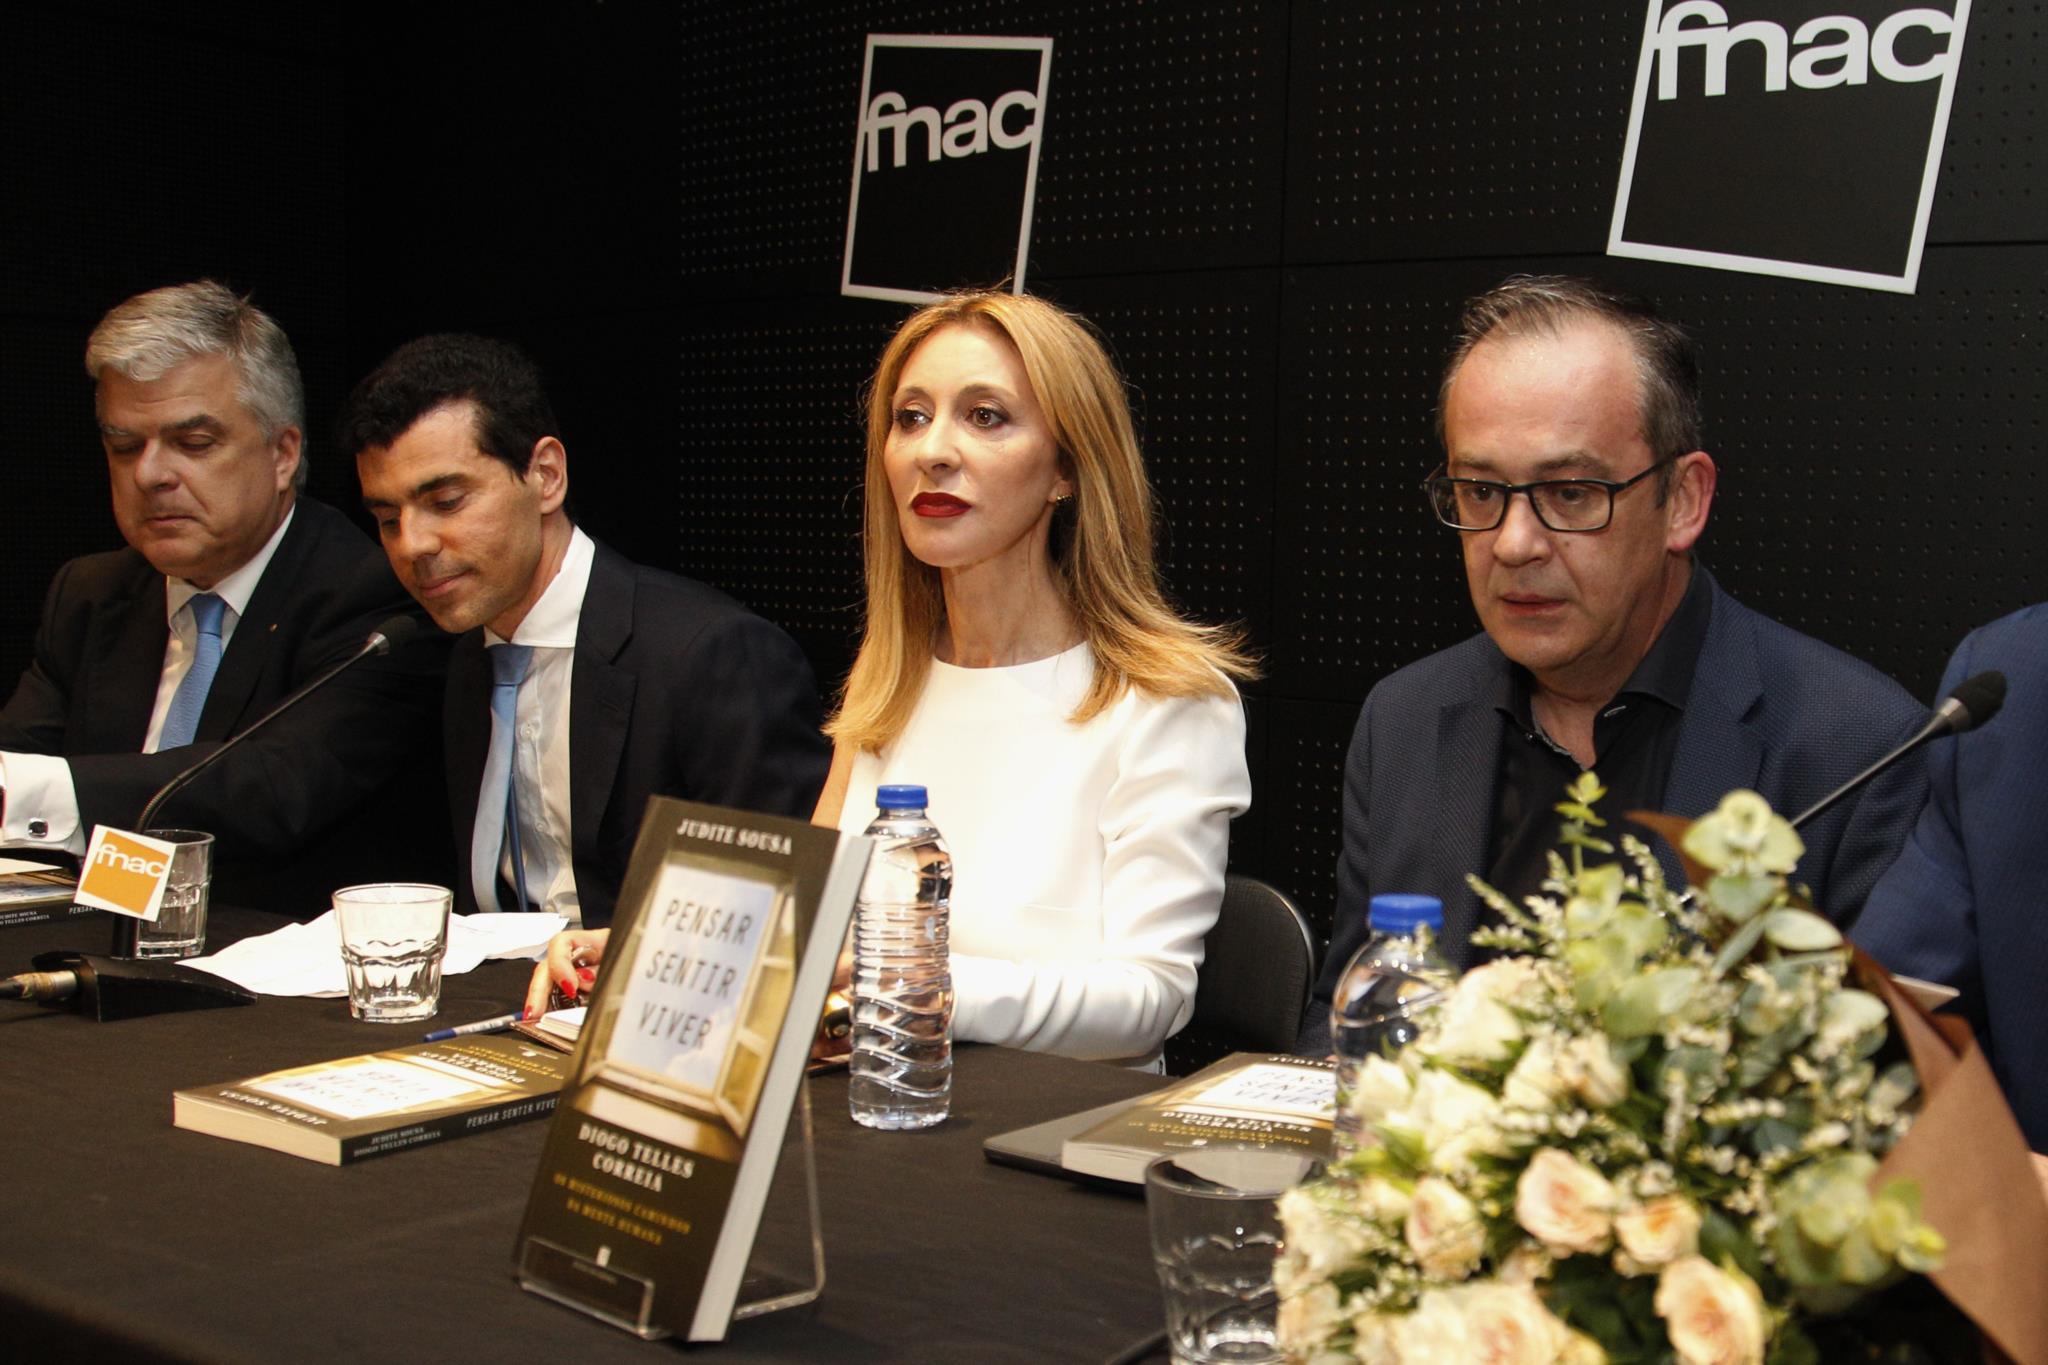 O director da Faculdade de Medicina da Universidade de Lisboa, Fausto Pinto; o professor Diogo Telles Correia e os jornalistas Judite Sousa e José Alberto Carvalho durante o lançamento